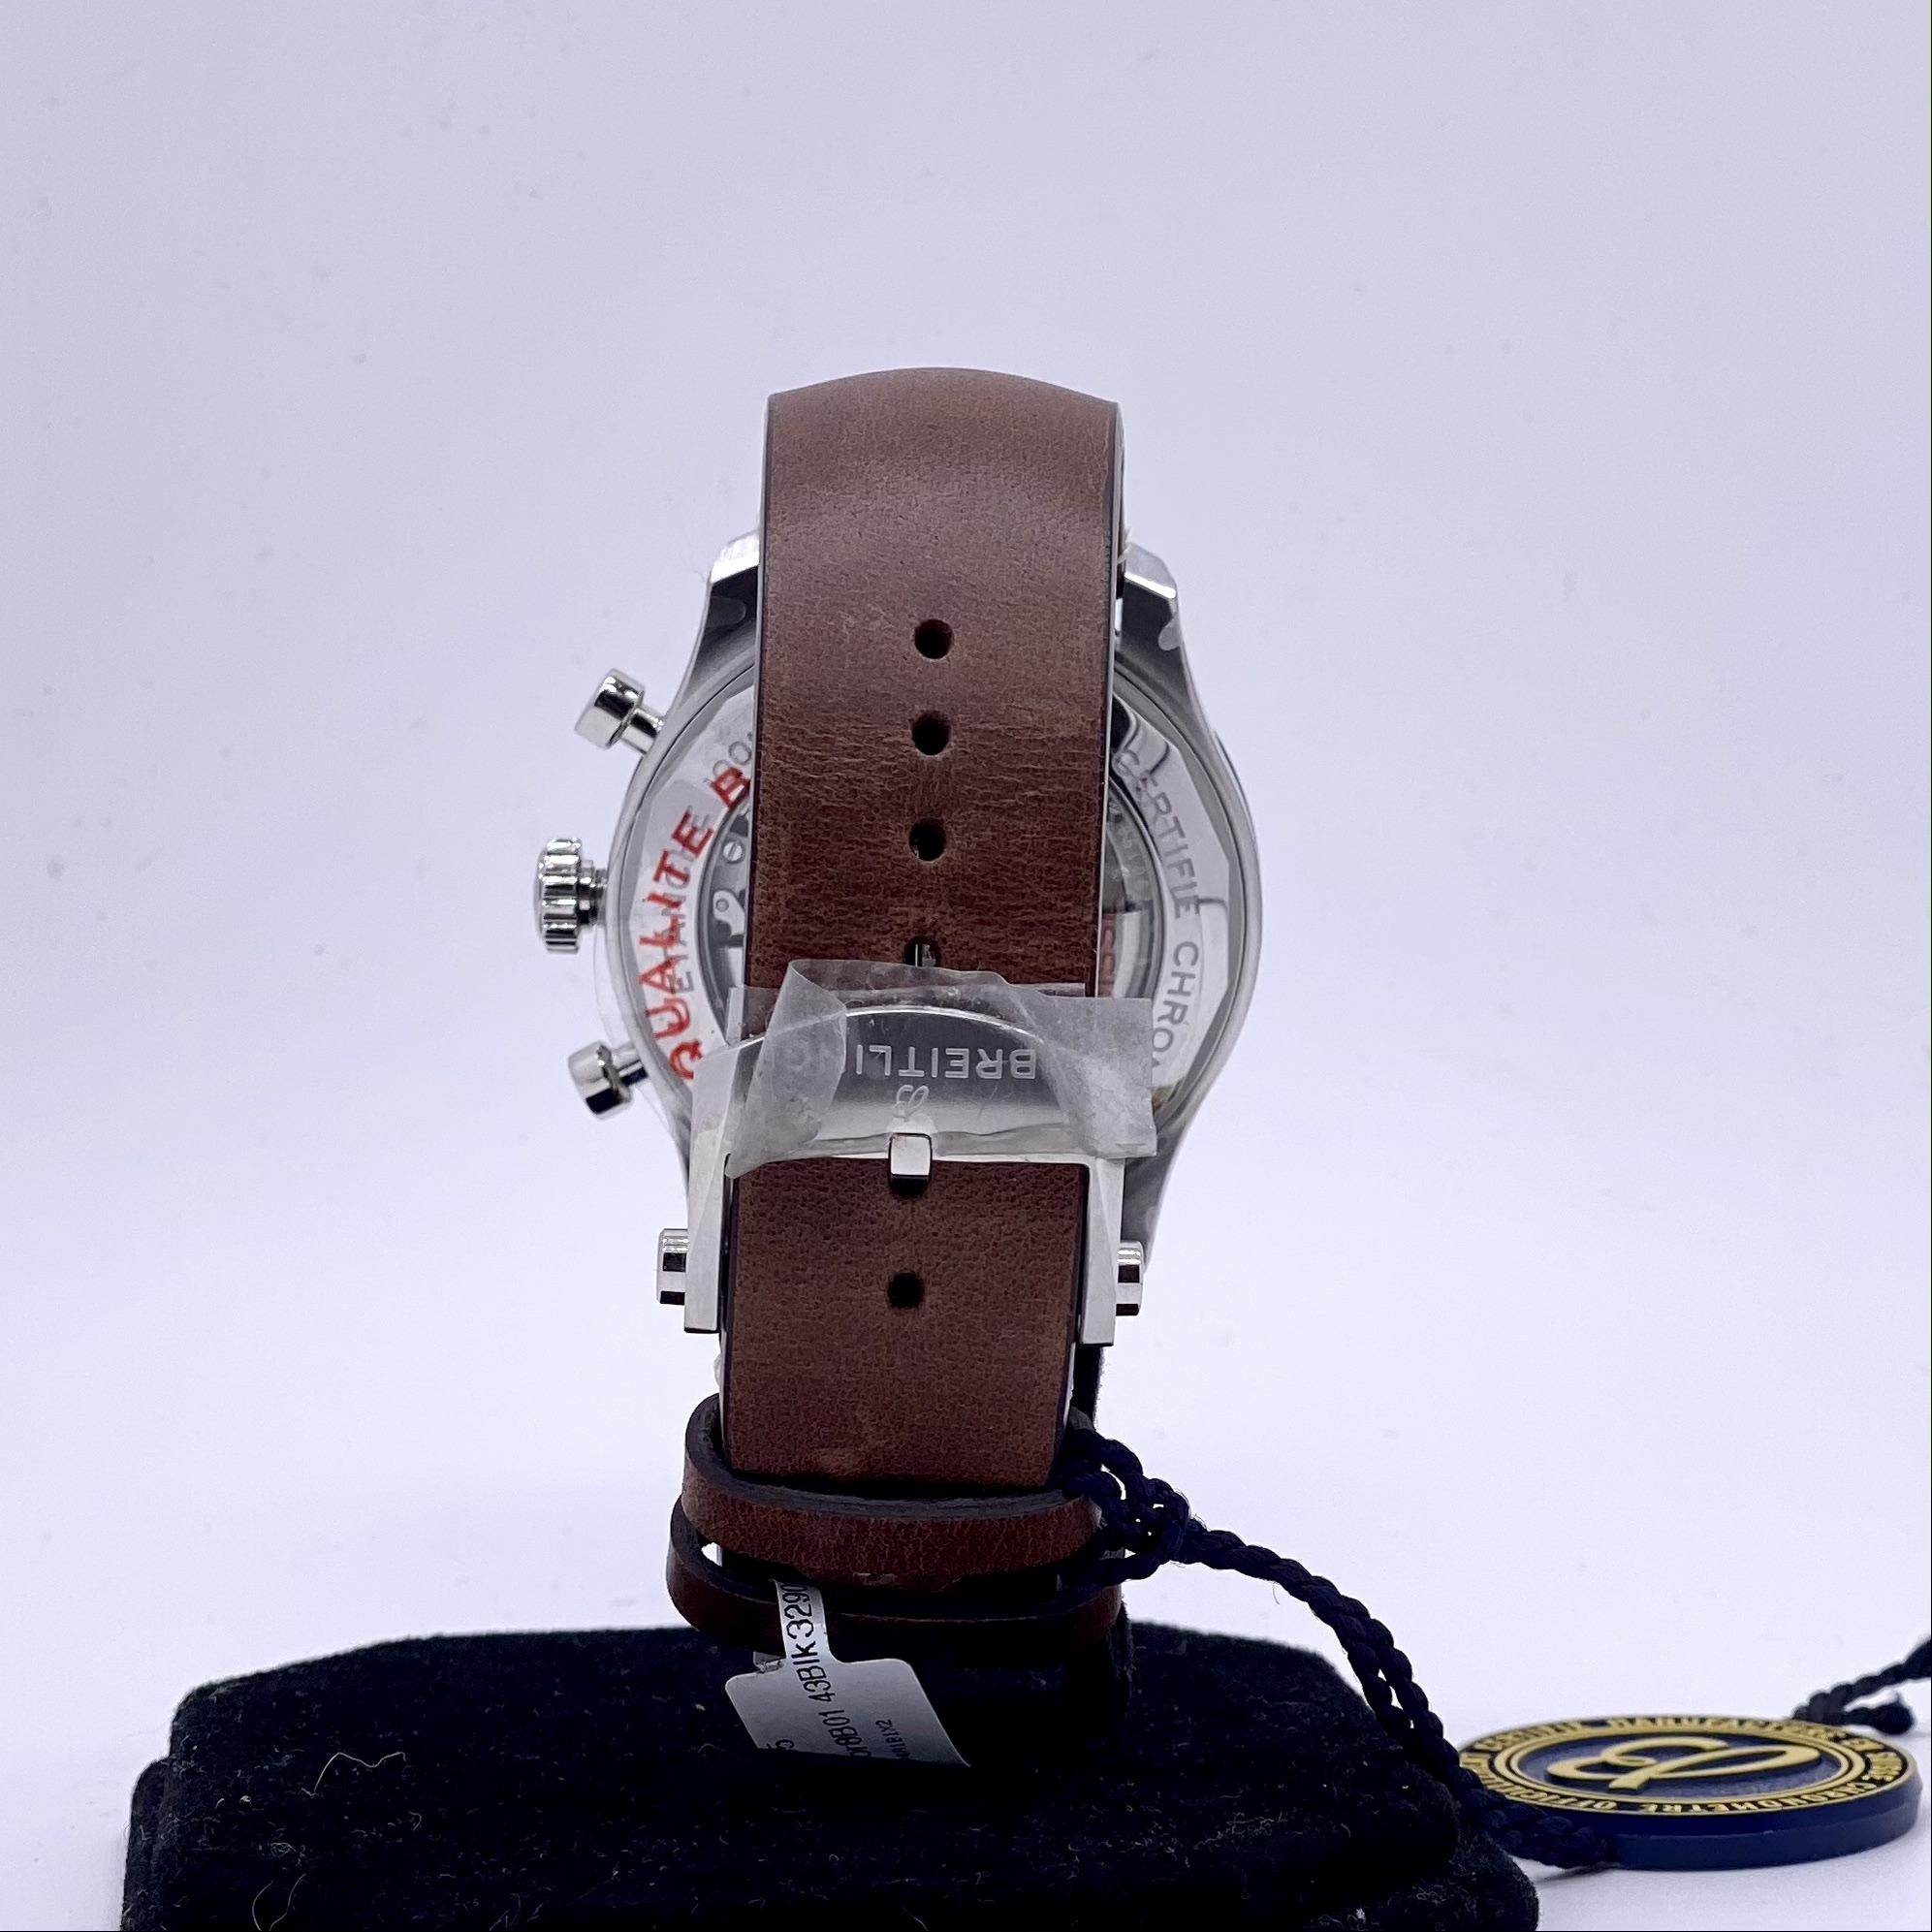 Breitling Chronometer AB0119 - Image 3 of 3